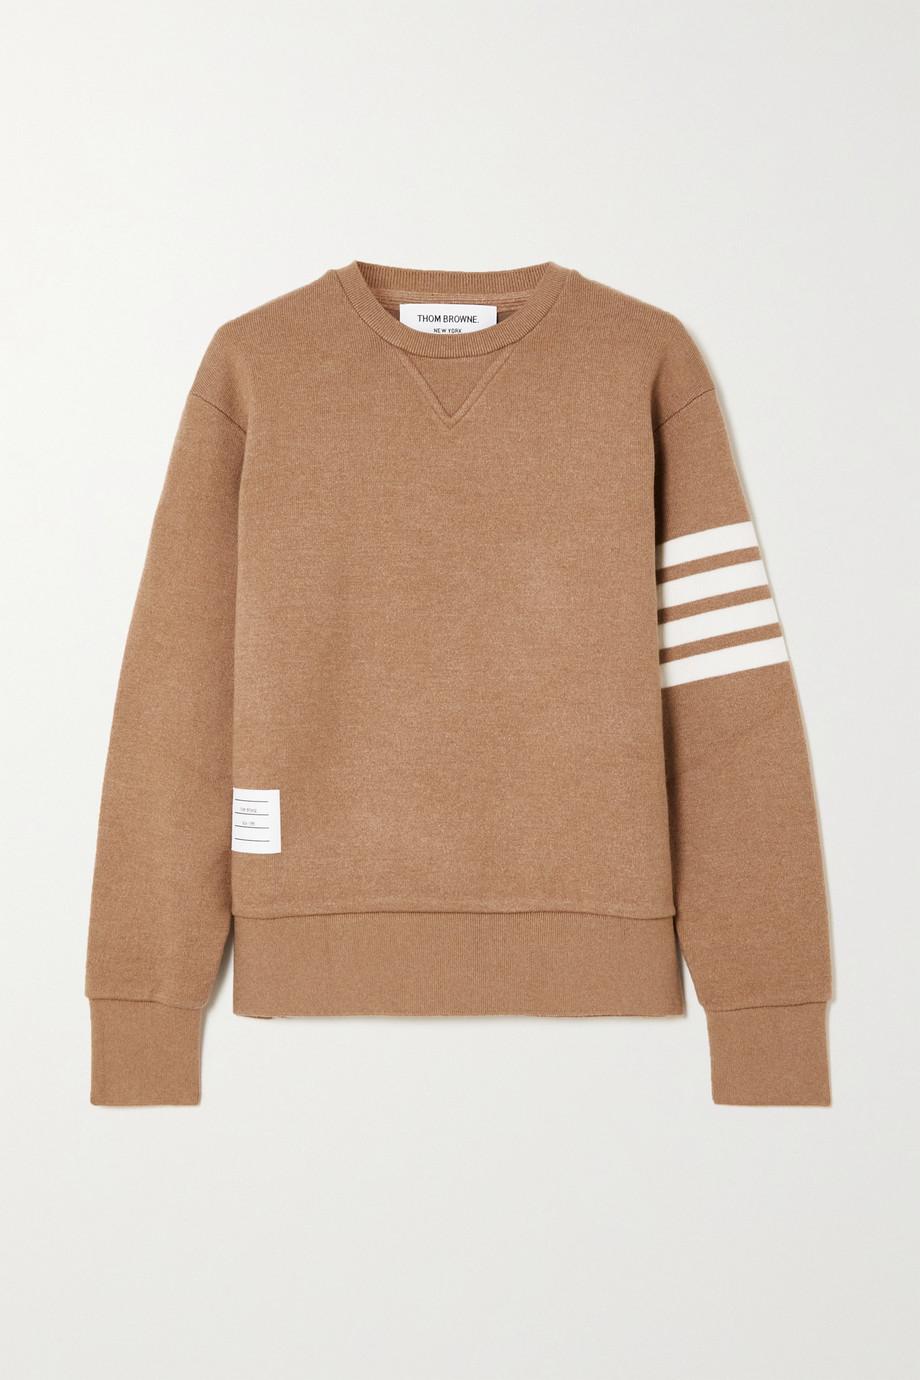 Thom Browne Striped cashmere-blend sweatshirt